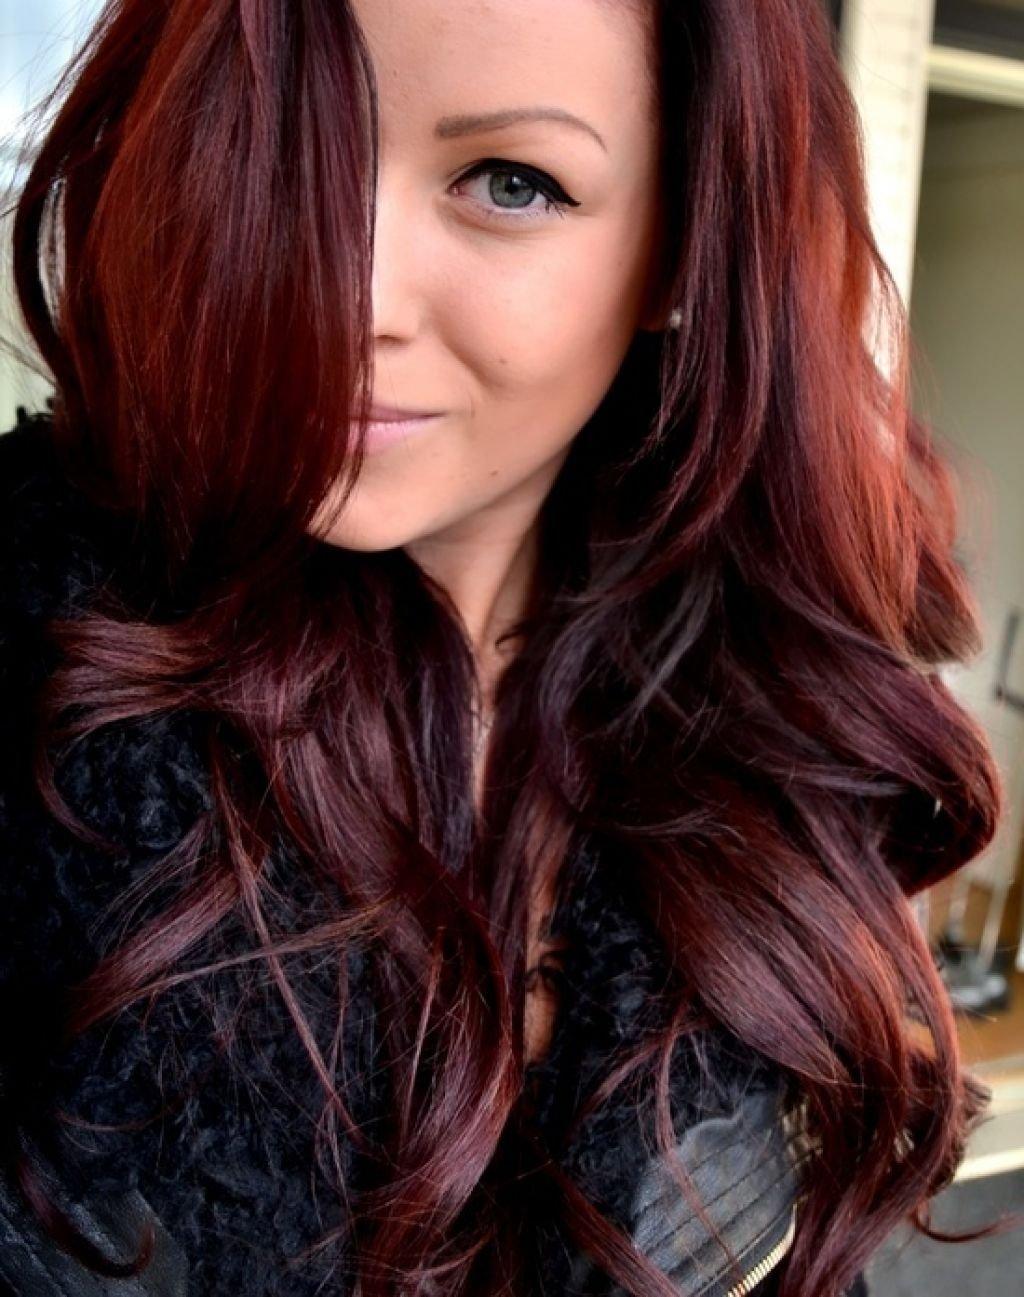 10 Cute Hair Color Ideas For 2014 long reddish brown hair color new colors pinterest reddish 9 2021